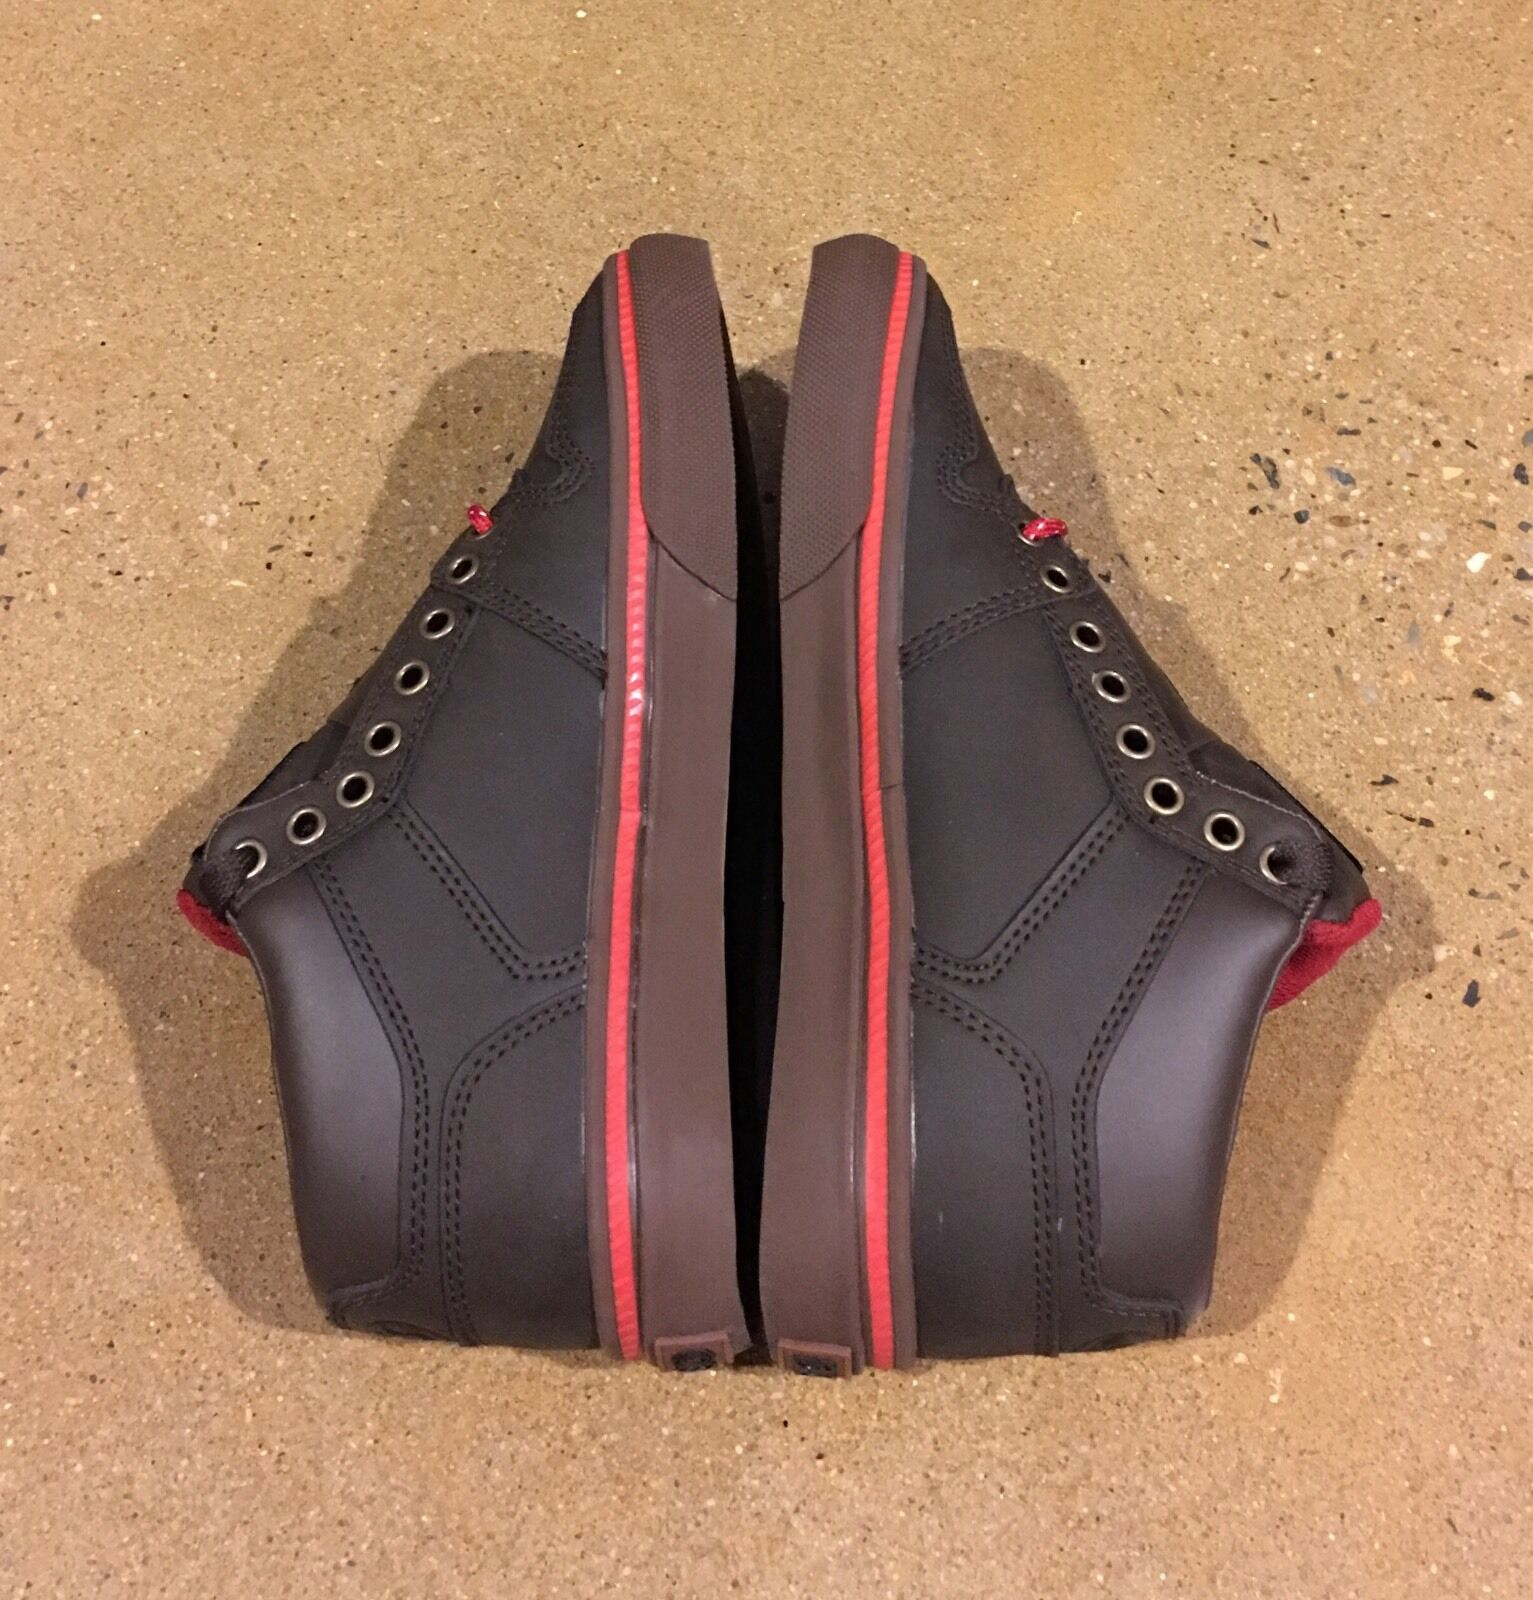 6ca3ac69573ce ... DVS Clip Snow Size 5.5 5.5 5.5 Brown Leather John Jackson Signature  Snow BMX Skate 3e0a95 ...